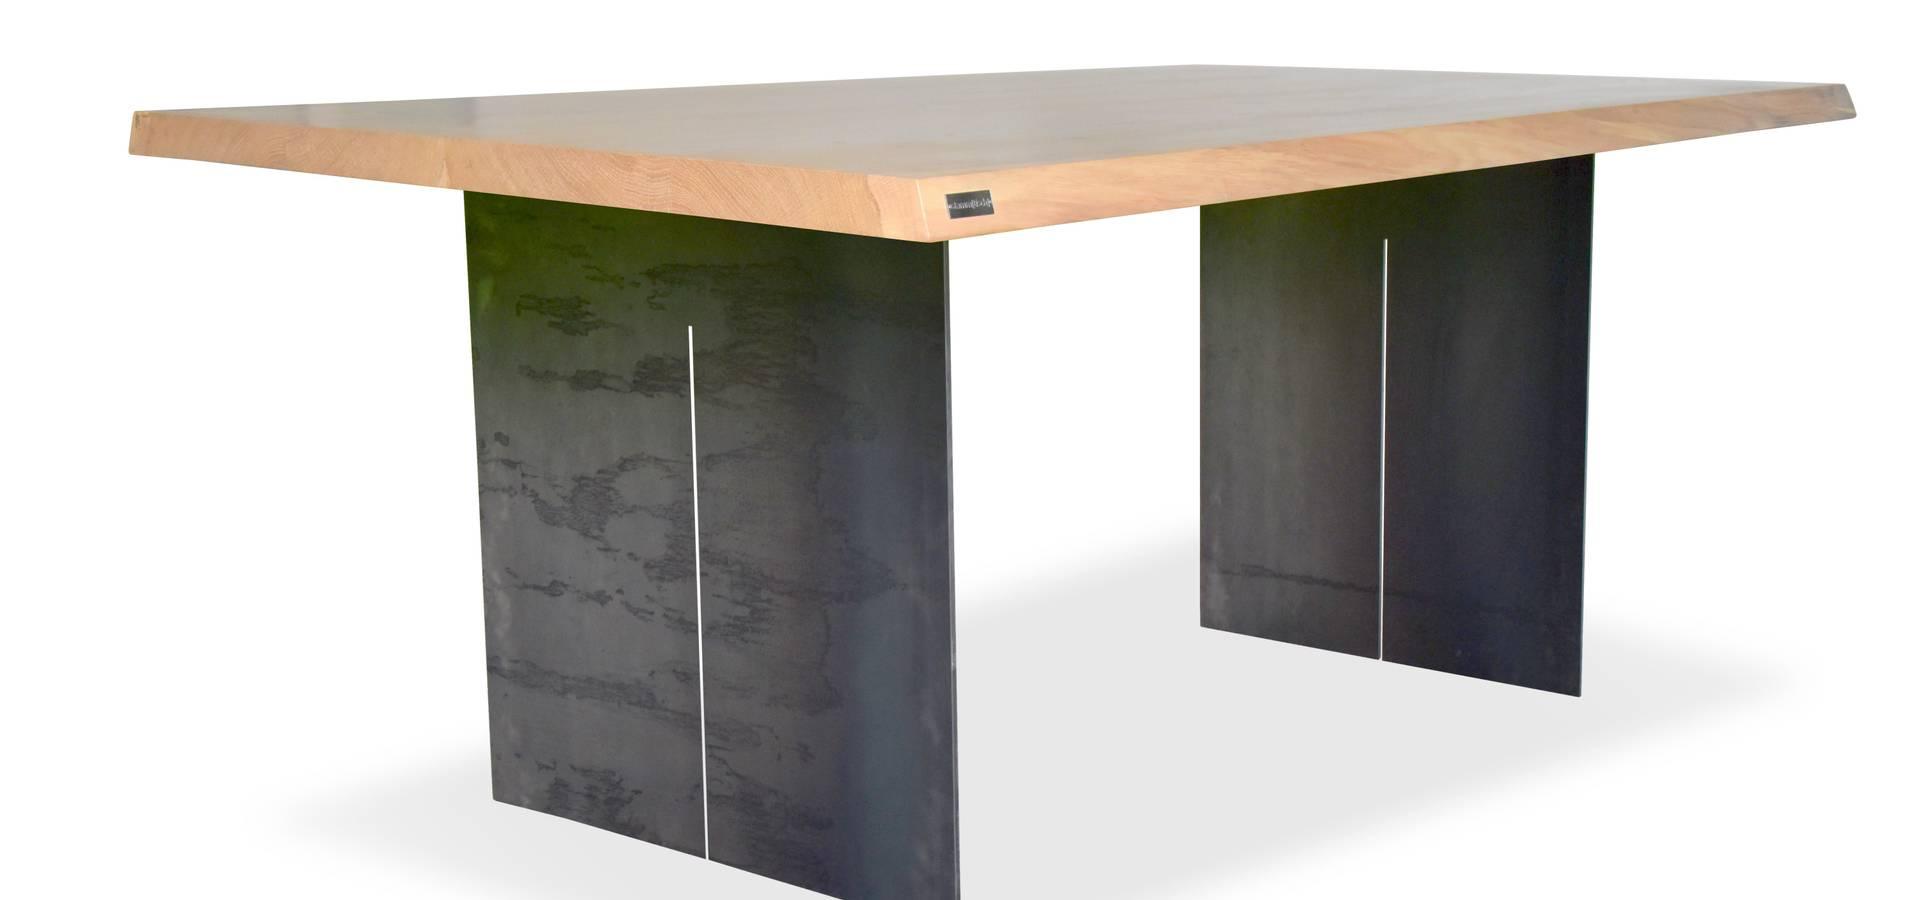 Stamm tisch design ug haftungsbeschr nkt m bel for Knebel design pool ug